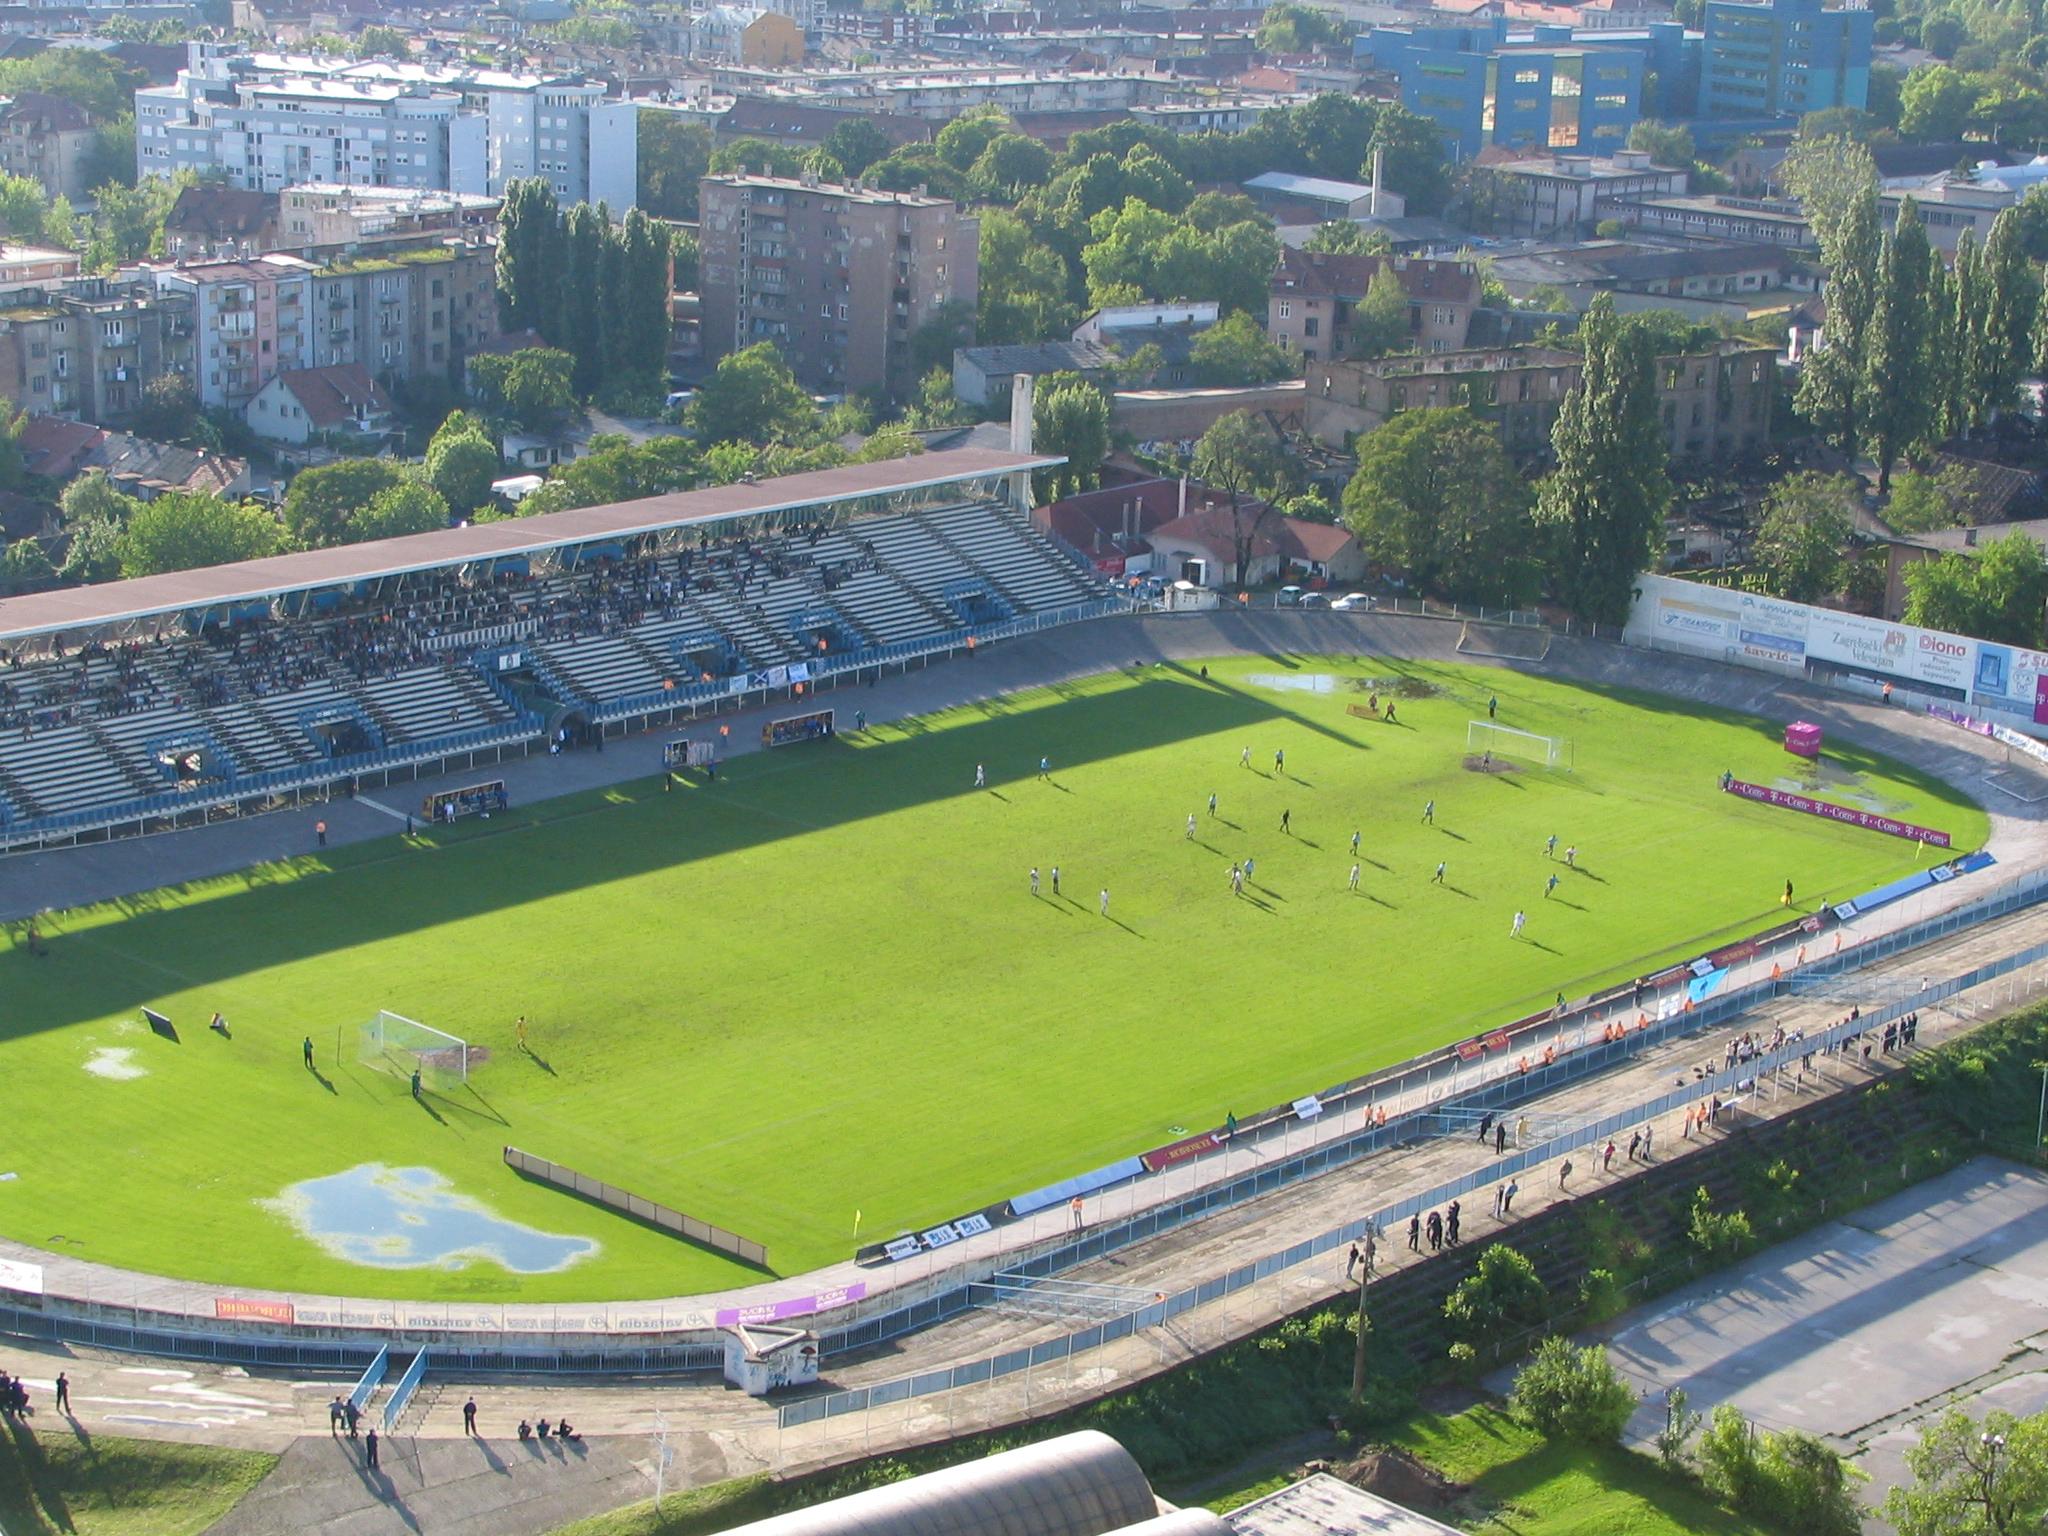 Pogled na utakmicu na stadionu NK Zagreb. [DZ 2012.]